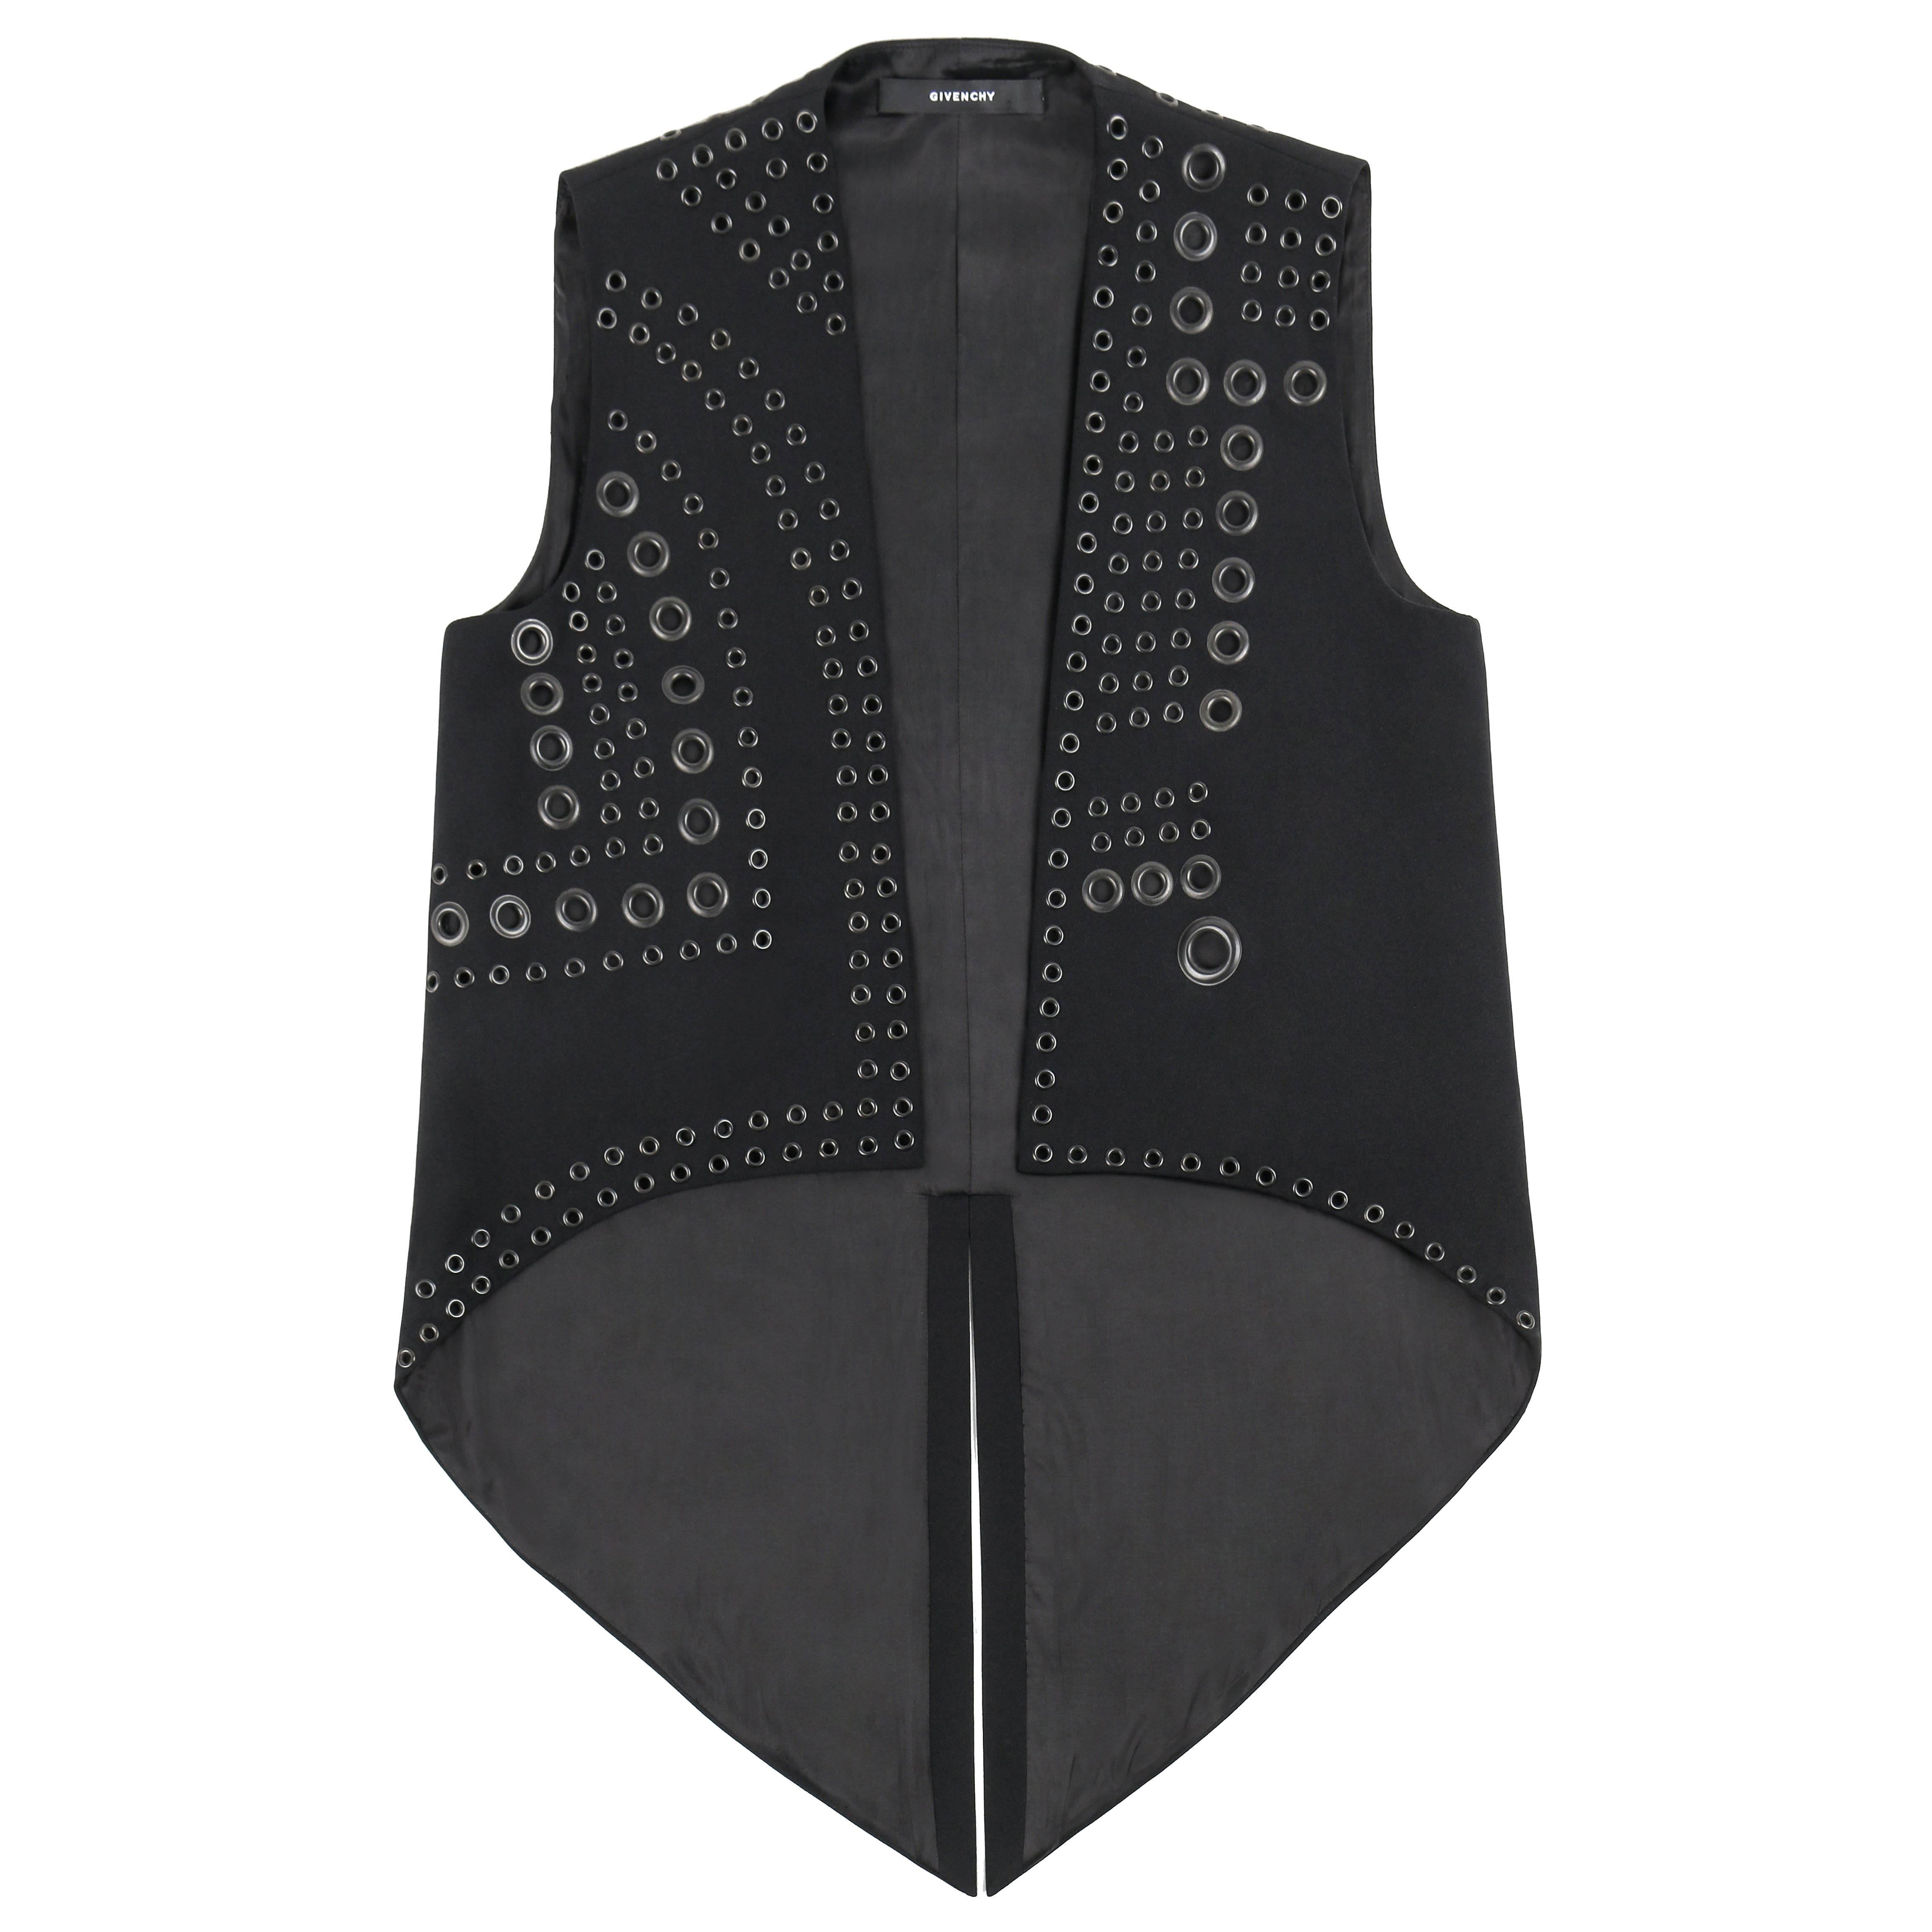 GIVENCHY c.2011 Black Gunmetal Grommet Detail Elongated Coattail Vest Size 36